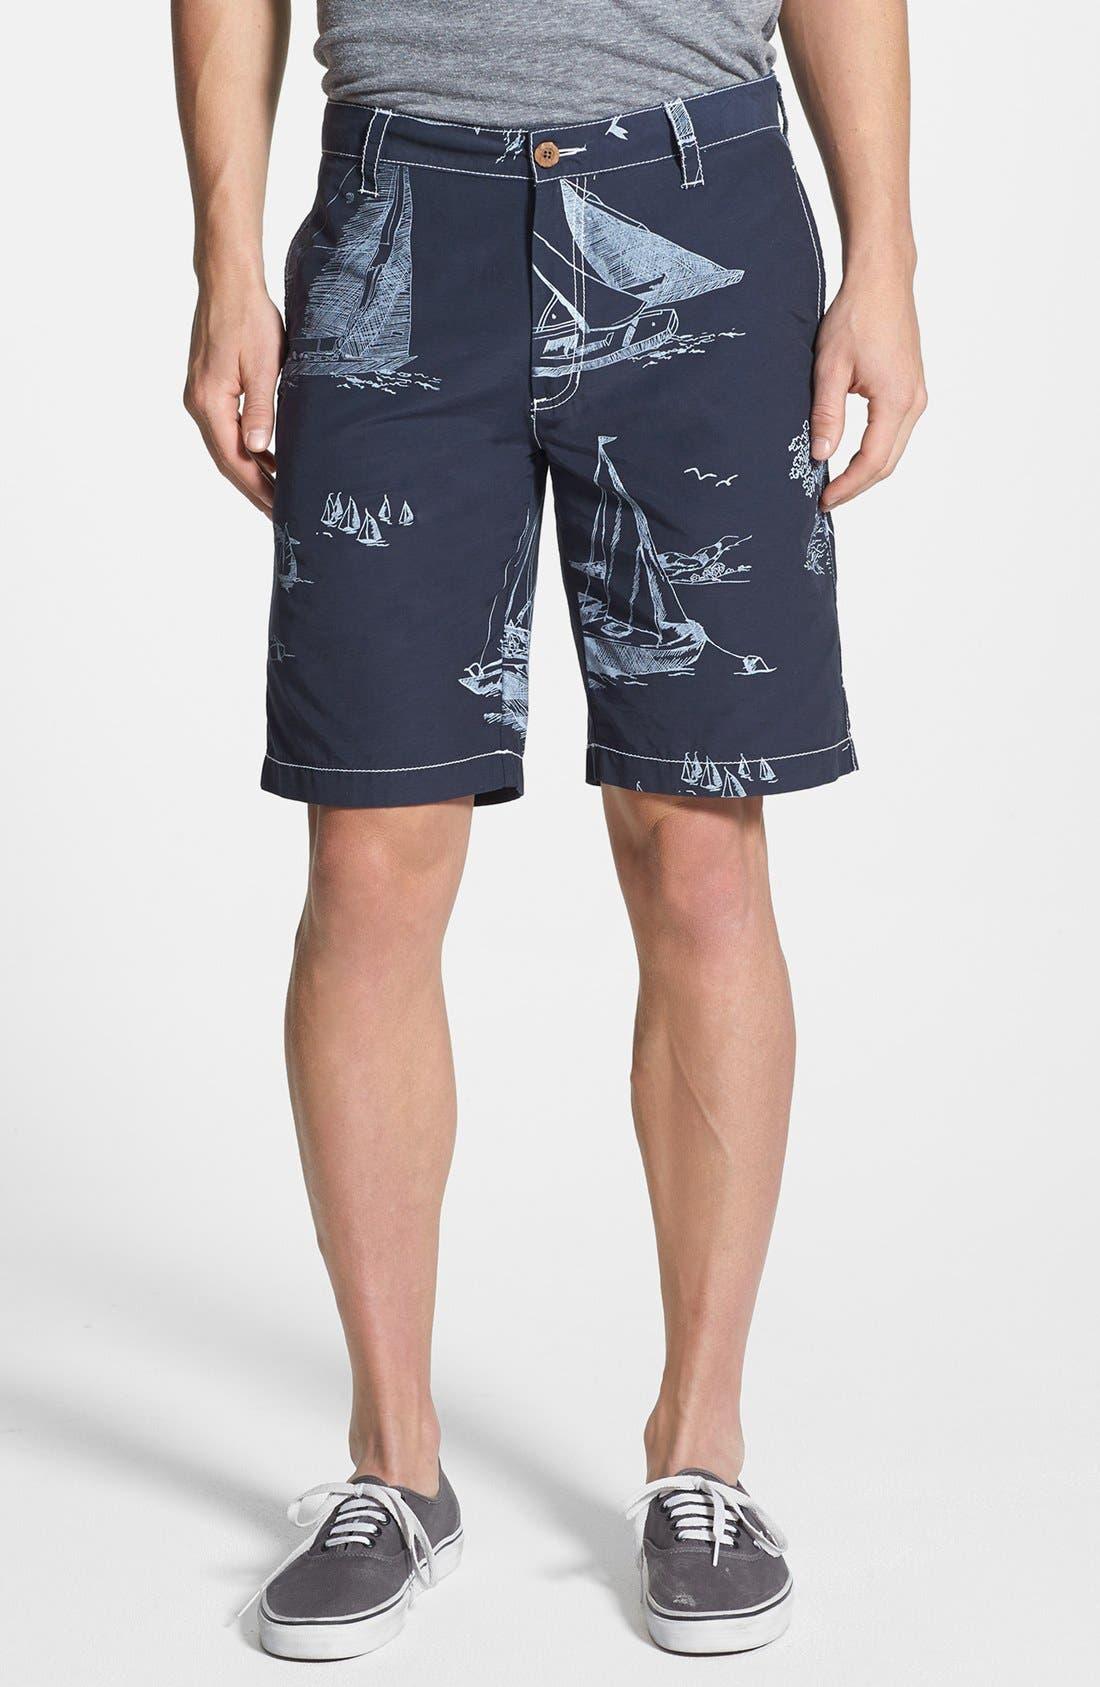 Alternate Image 1 Selected - Tailor Vintage Sailboat Print Hybrid Shorts